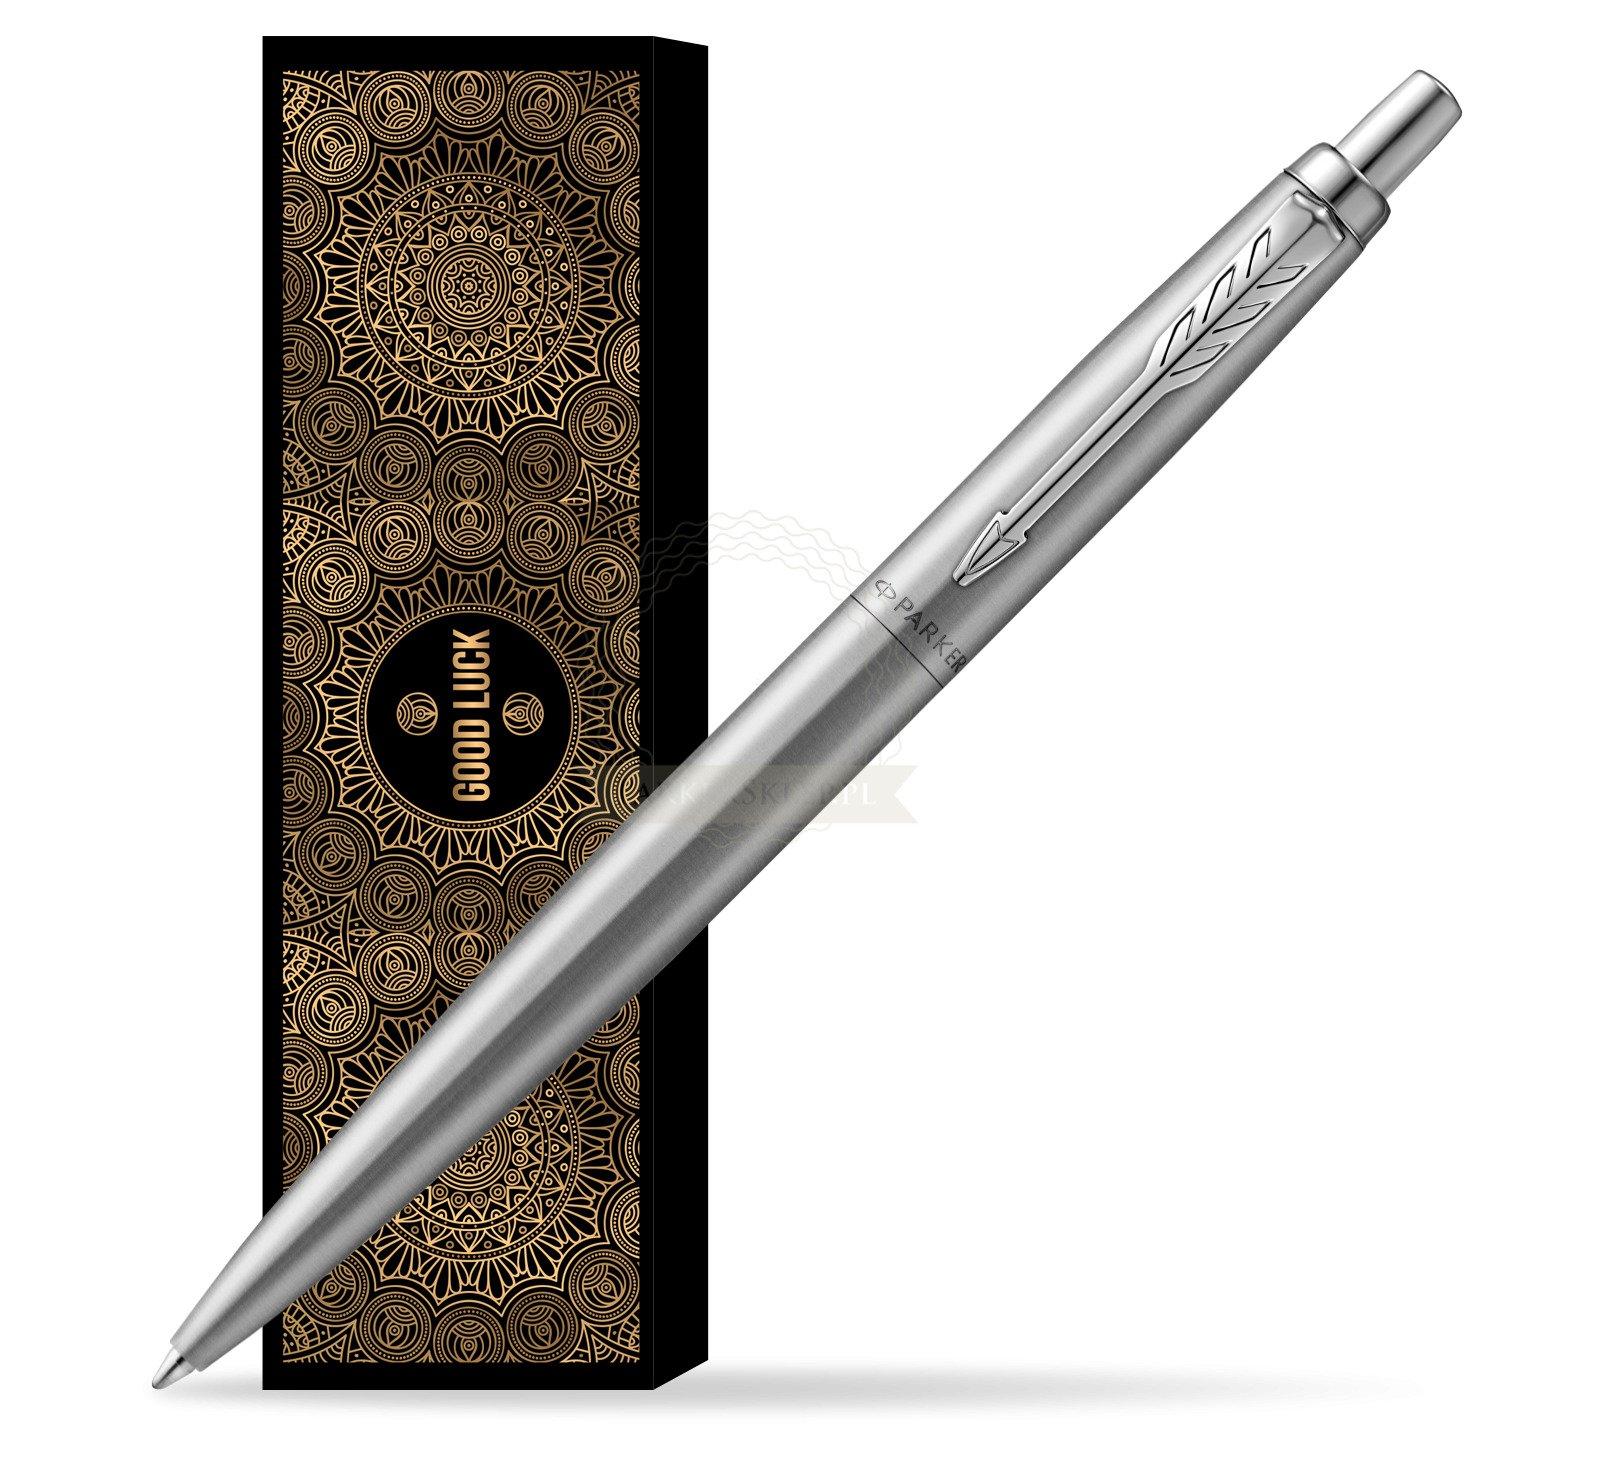 Parker Jotter Special Edition CT Ballpoint Pen BallPen Crescent White New loose